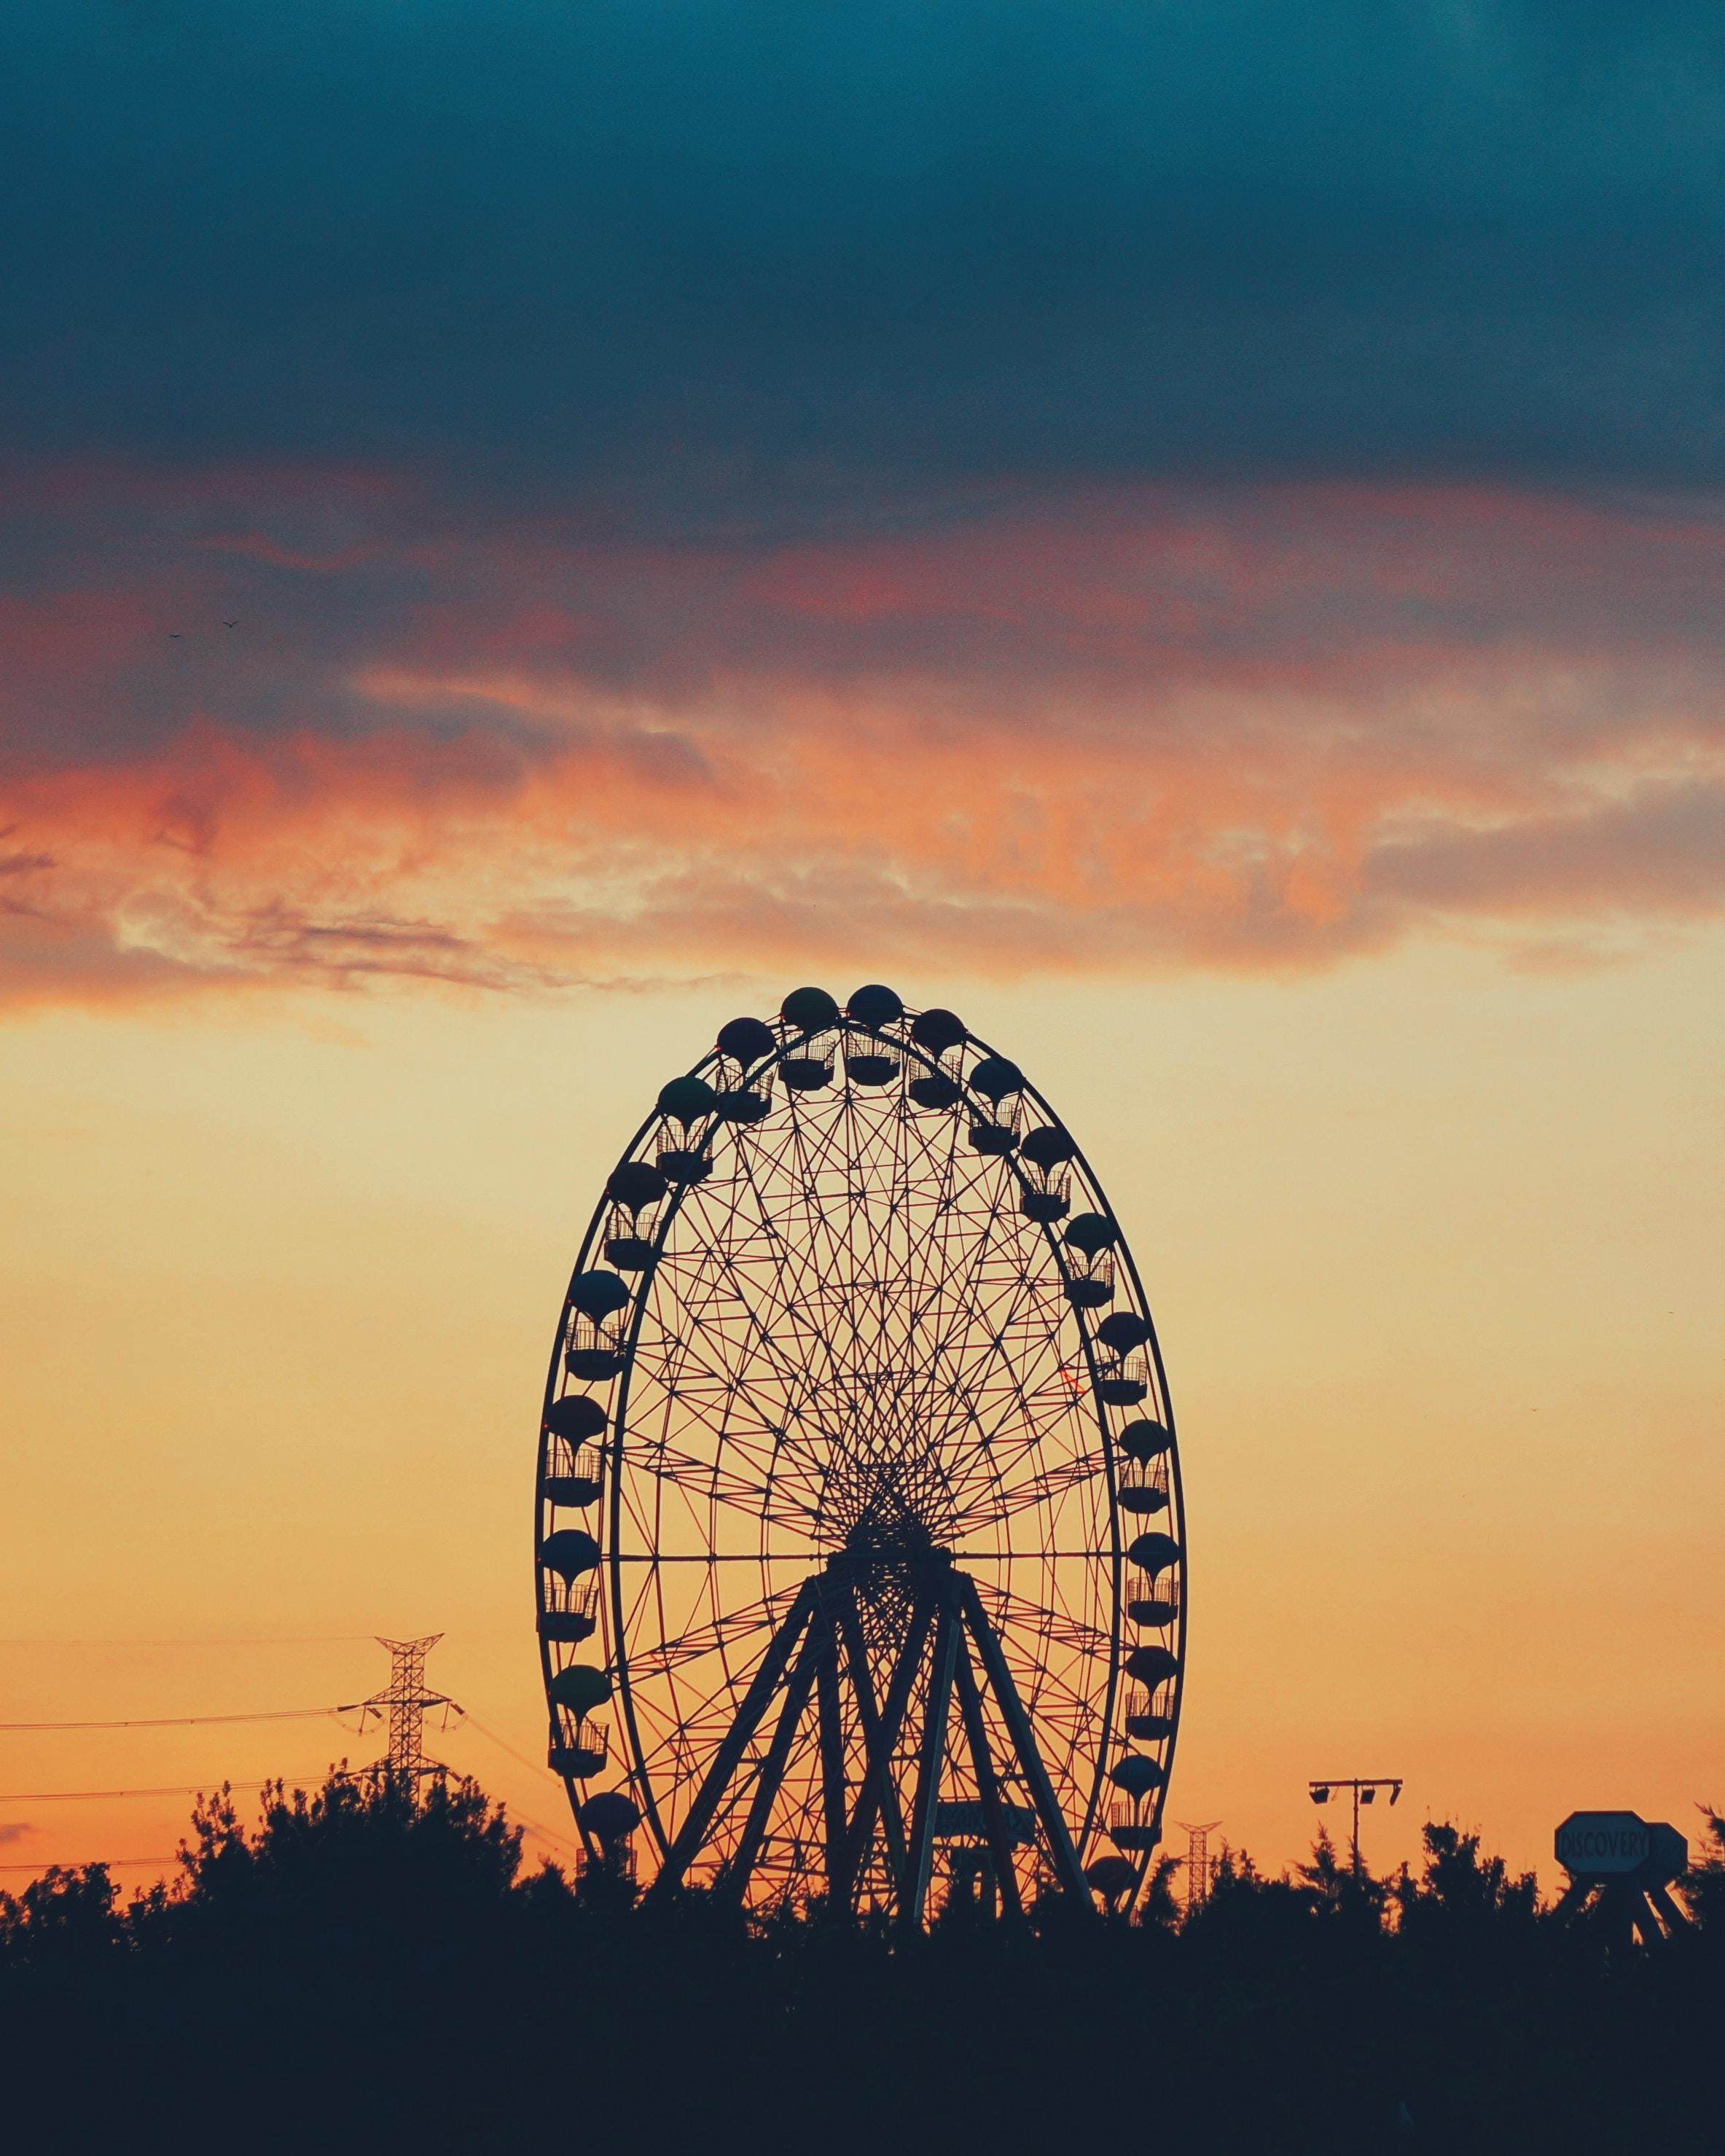 silhouette of Ferris wheel during golden hour